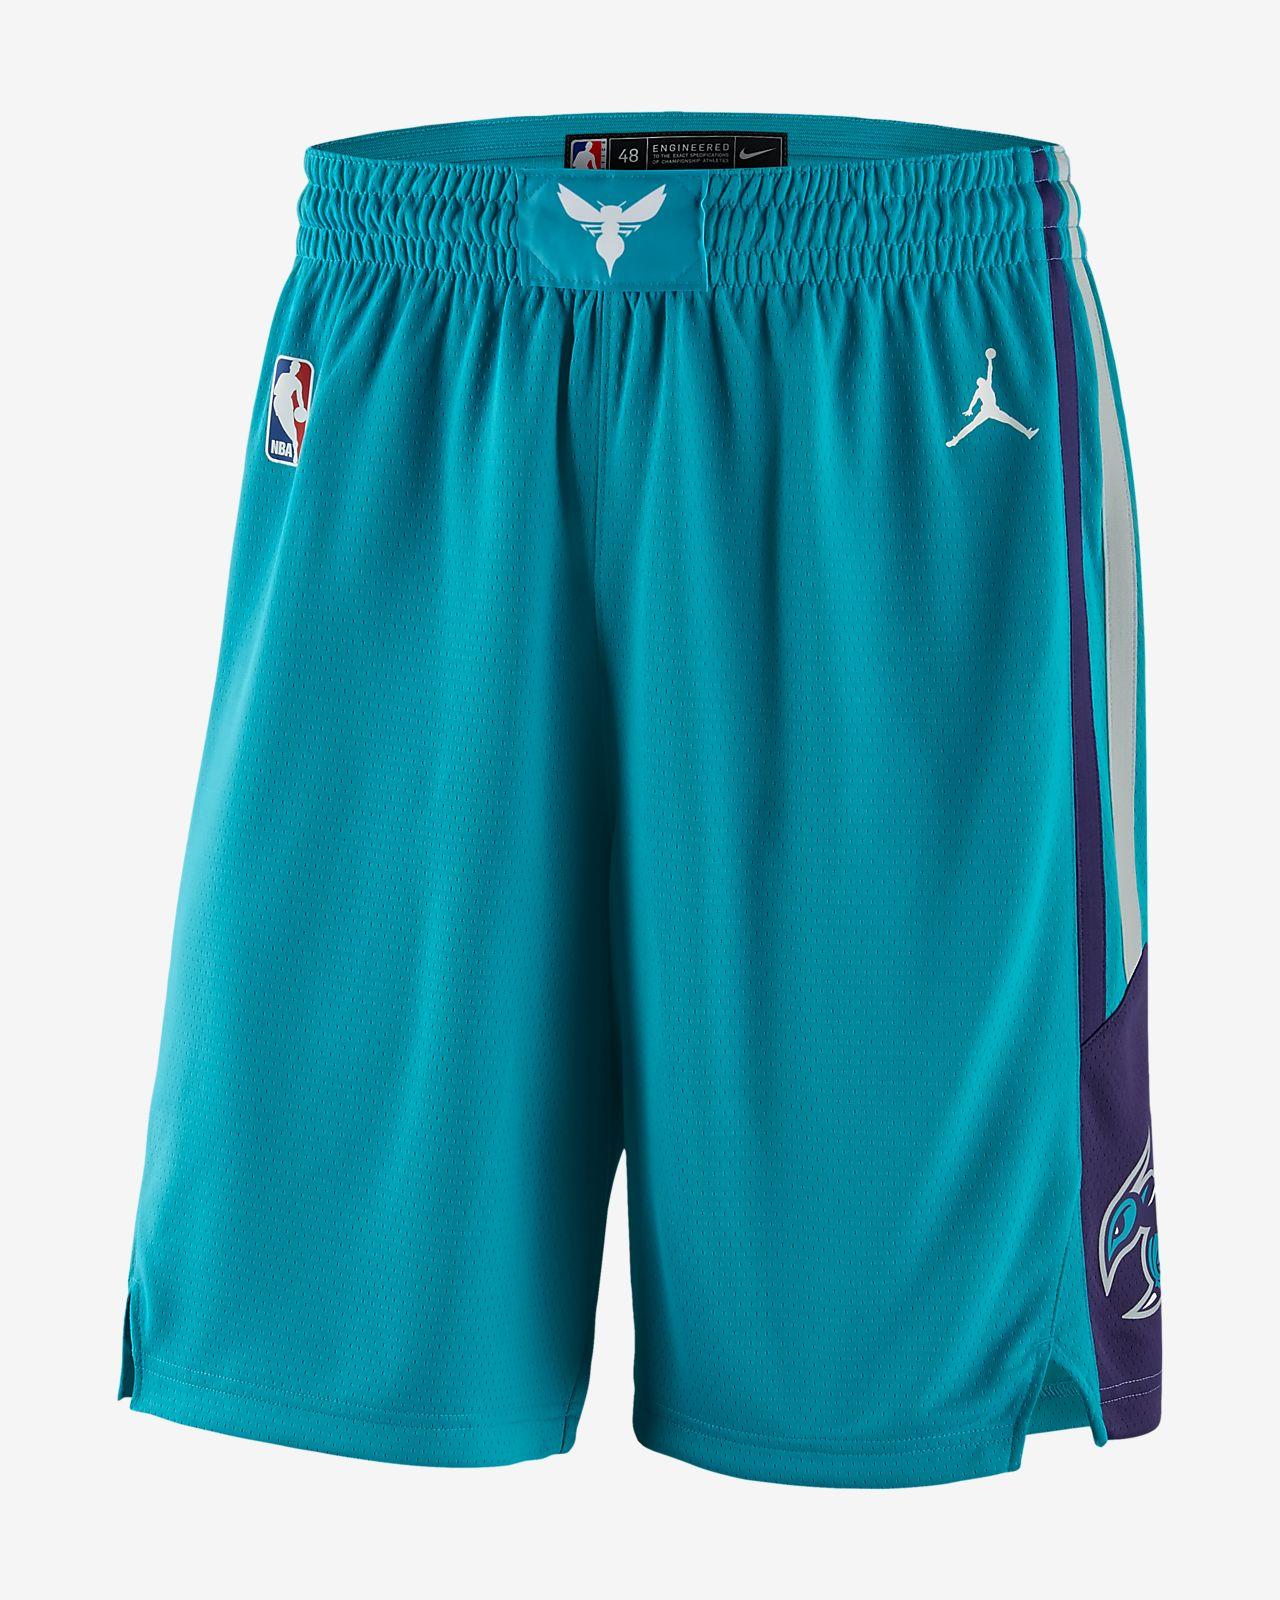 Мужские шорты Jordan НБА Charlotte Hornets Icon Edition Swingman ... 64c30a3515a